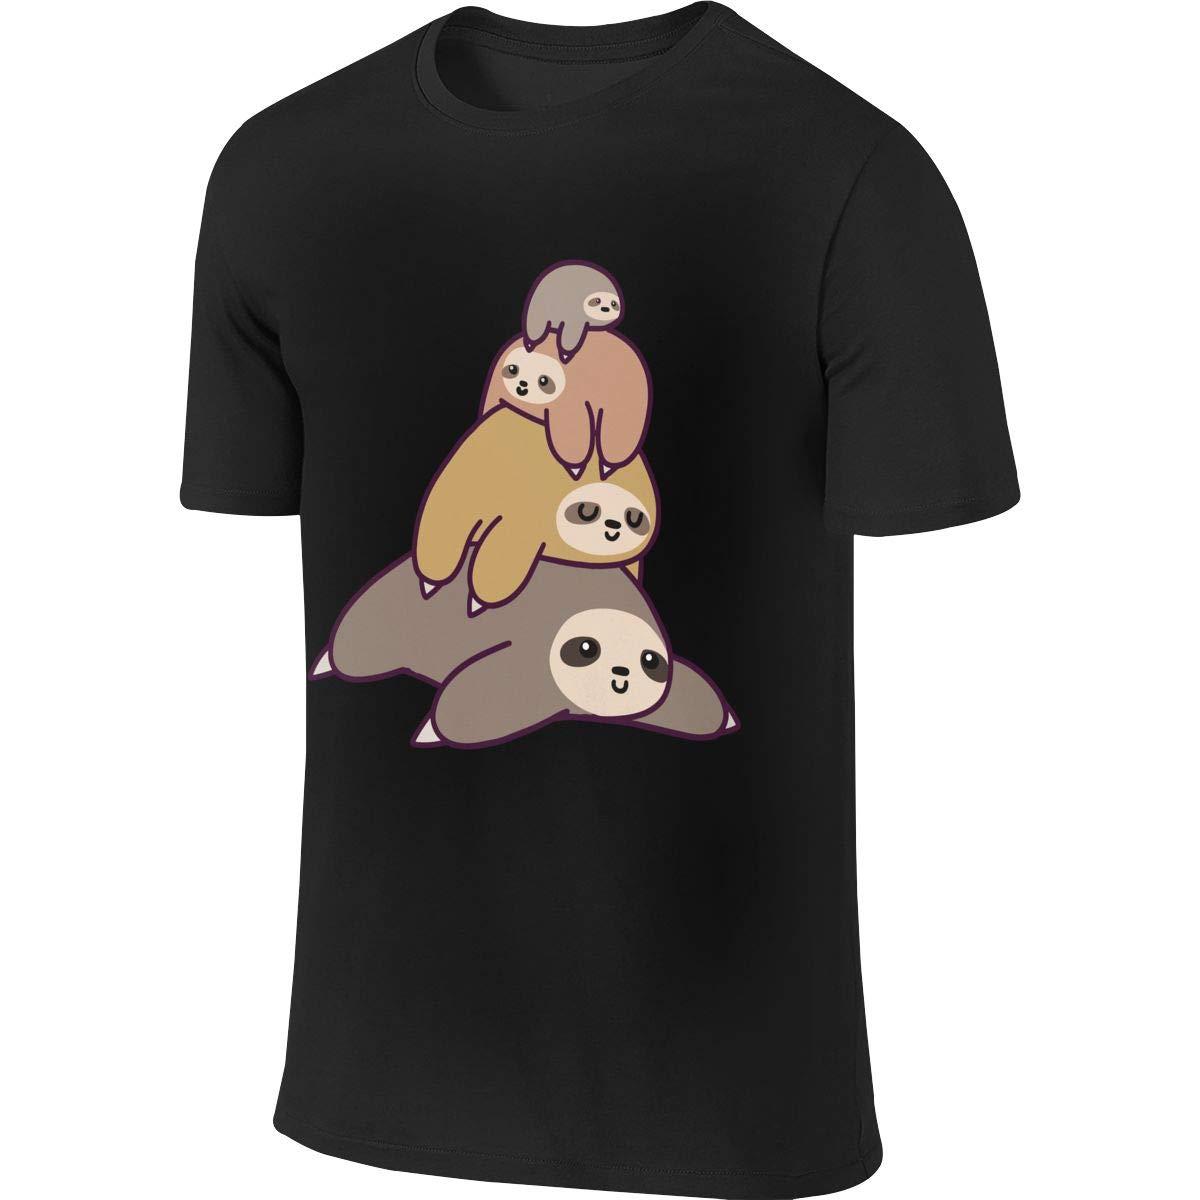 Wangx-4 Sloth Stack Graphic T-shirt, Short Sleeve Tee